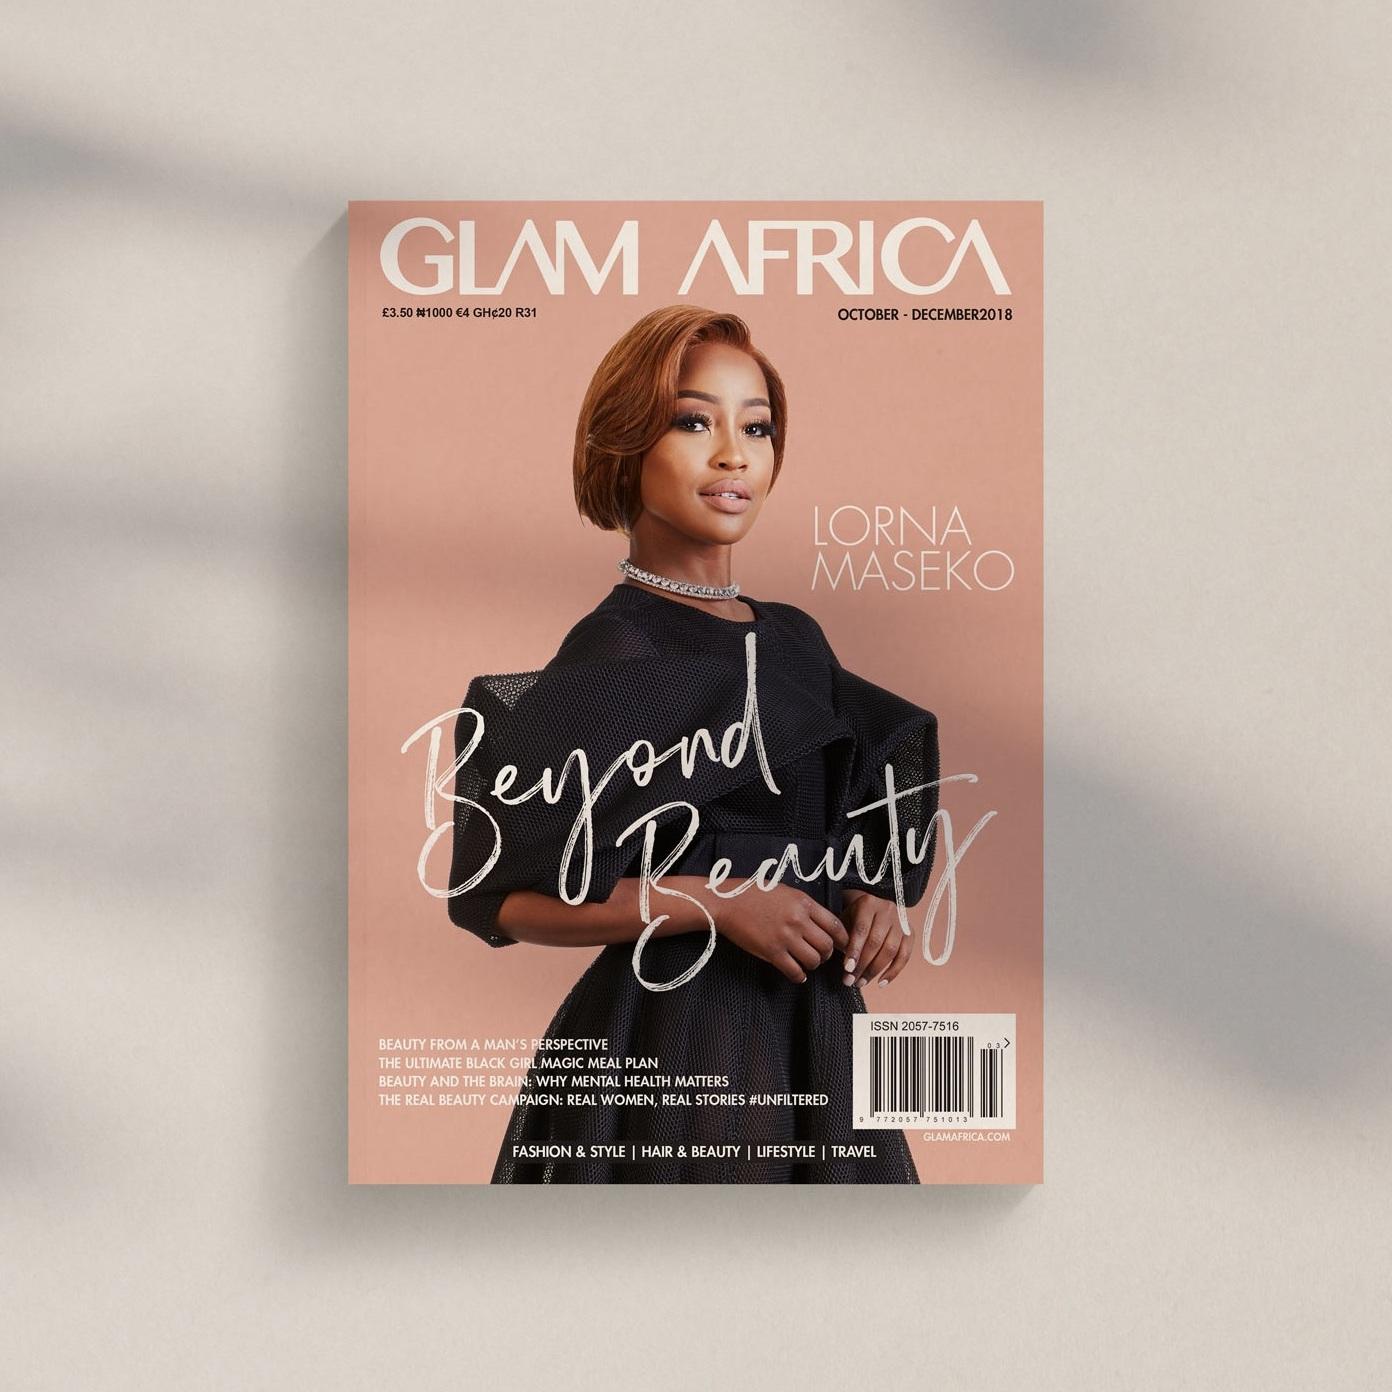 bask-studio-glam-africa